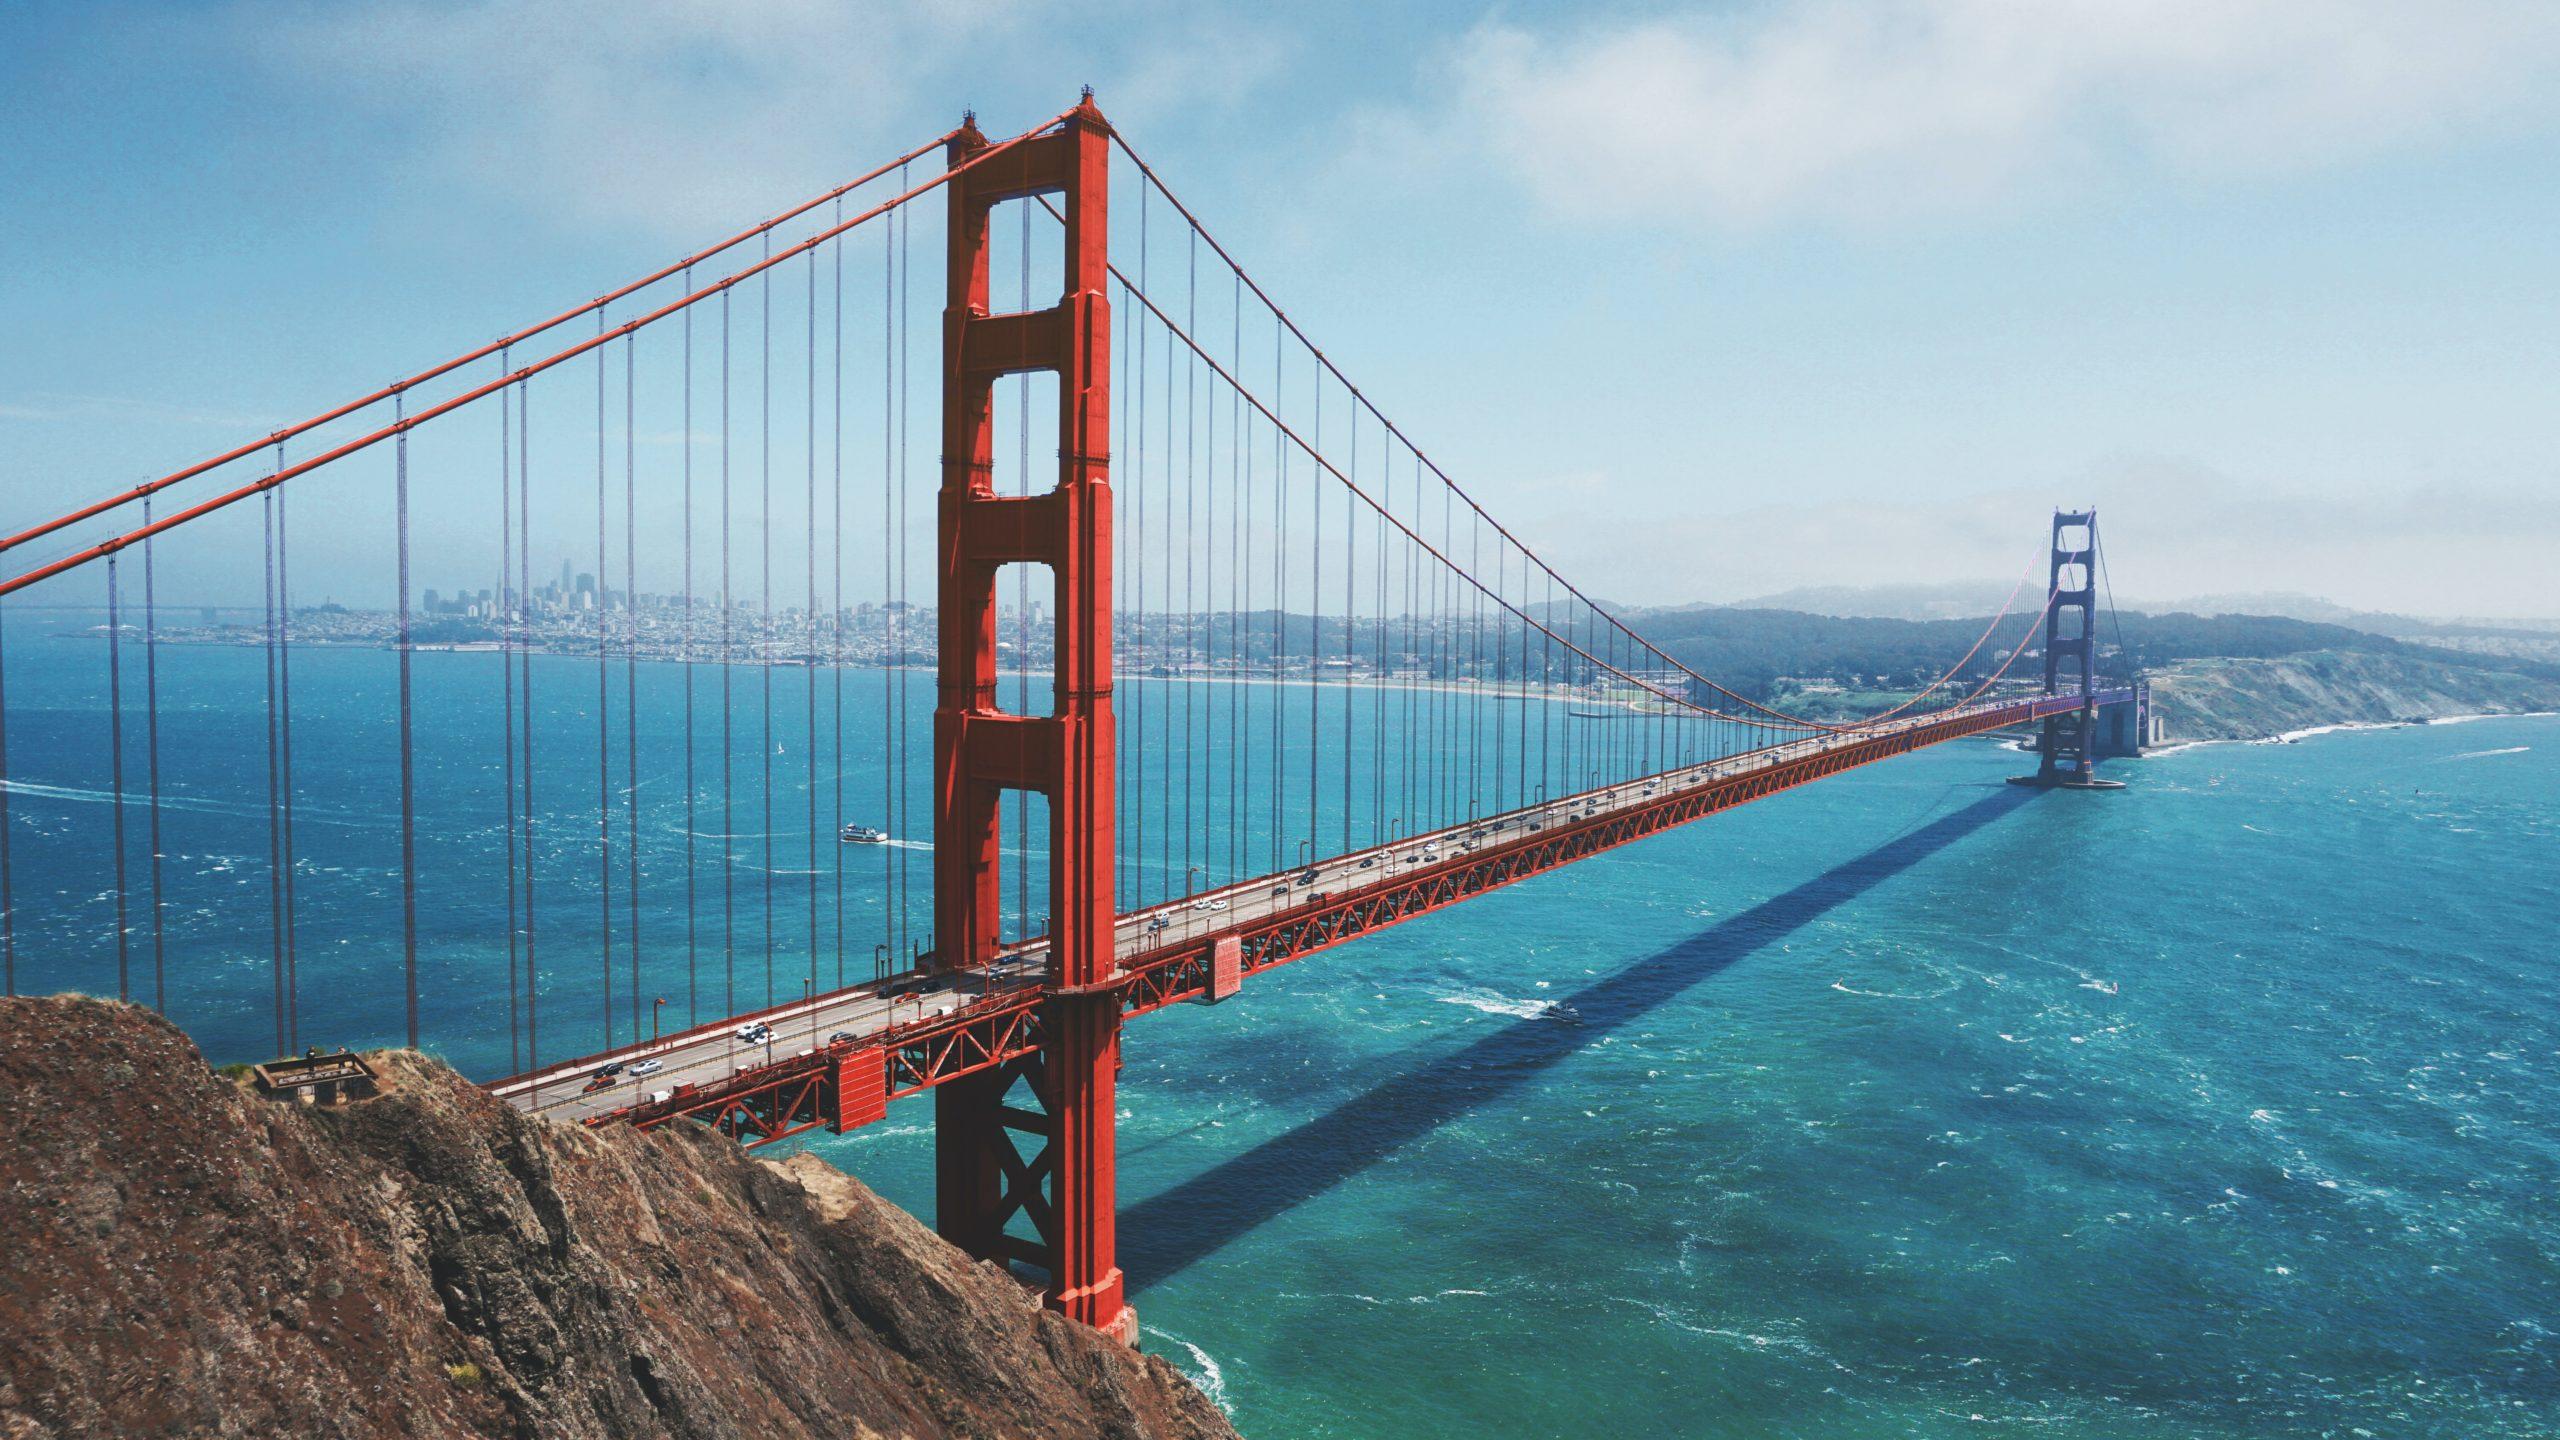 golden gate bridge in san francisco united states